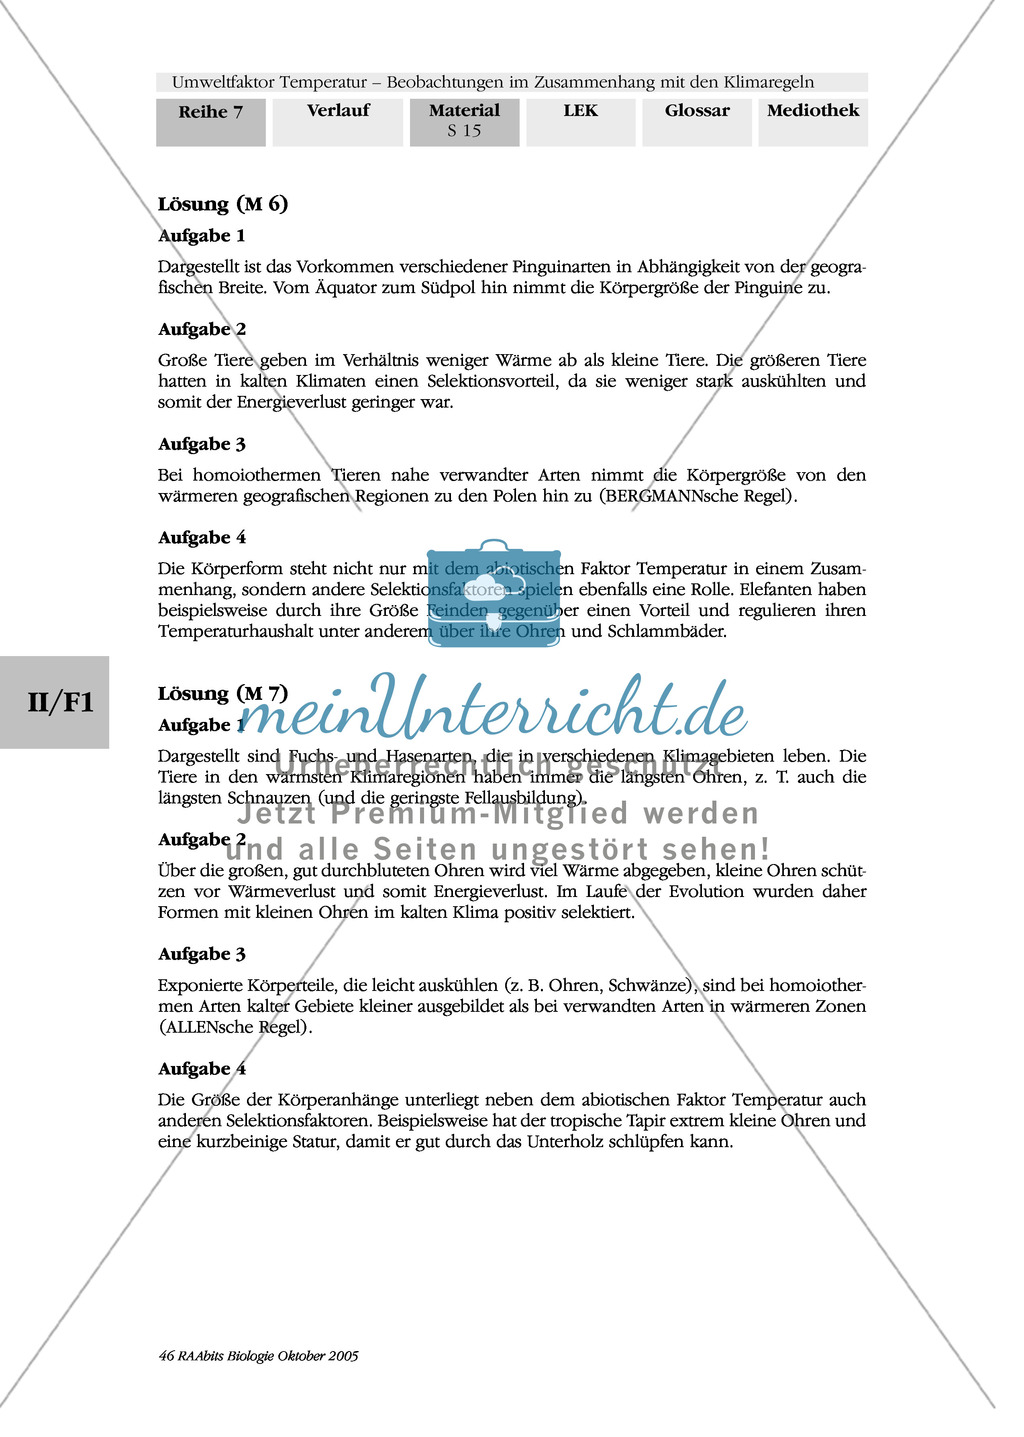 Temperatur: Allensche Regel: Fuchsarten, Hasenarten Preview 3